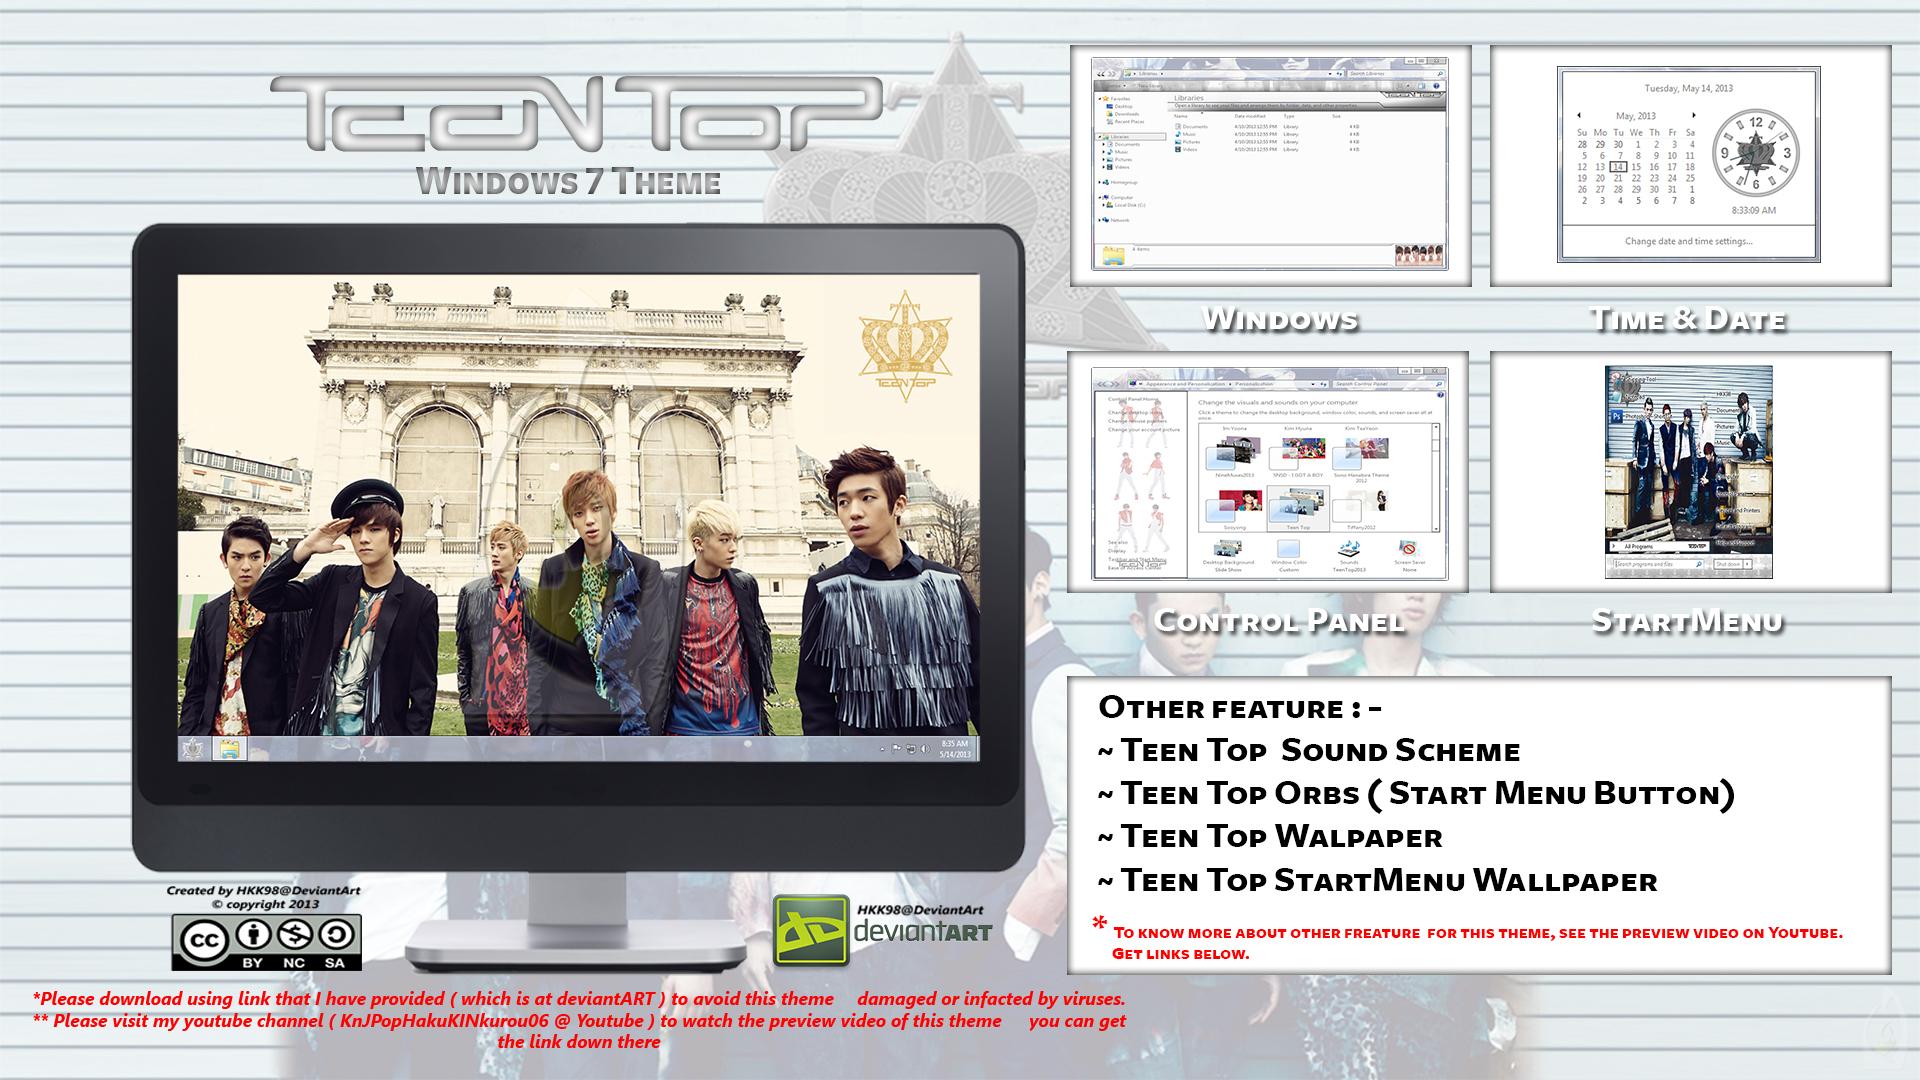 2013 Theme Teen Top Kpop For Windows 7 By Hkk98 On